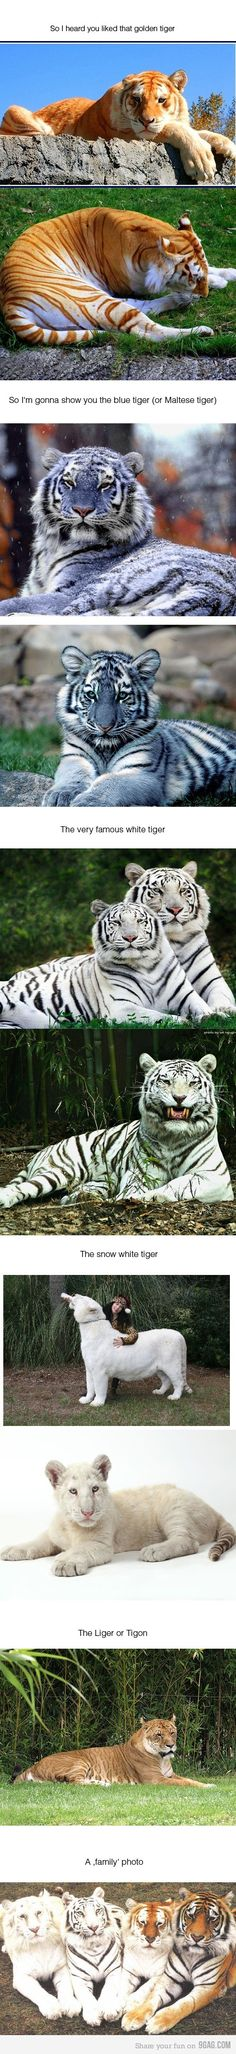 BIG CAT LOVE